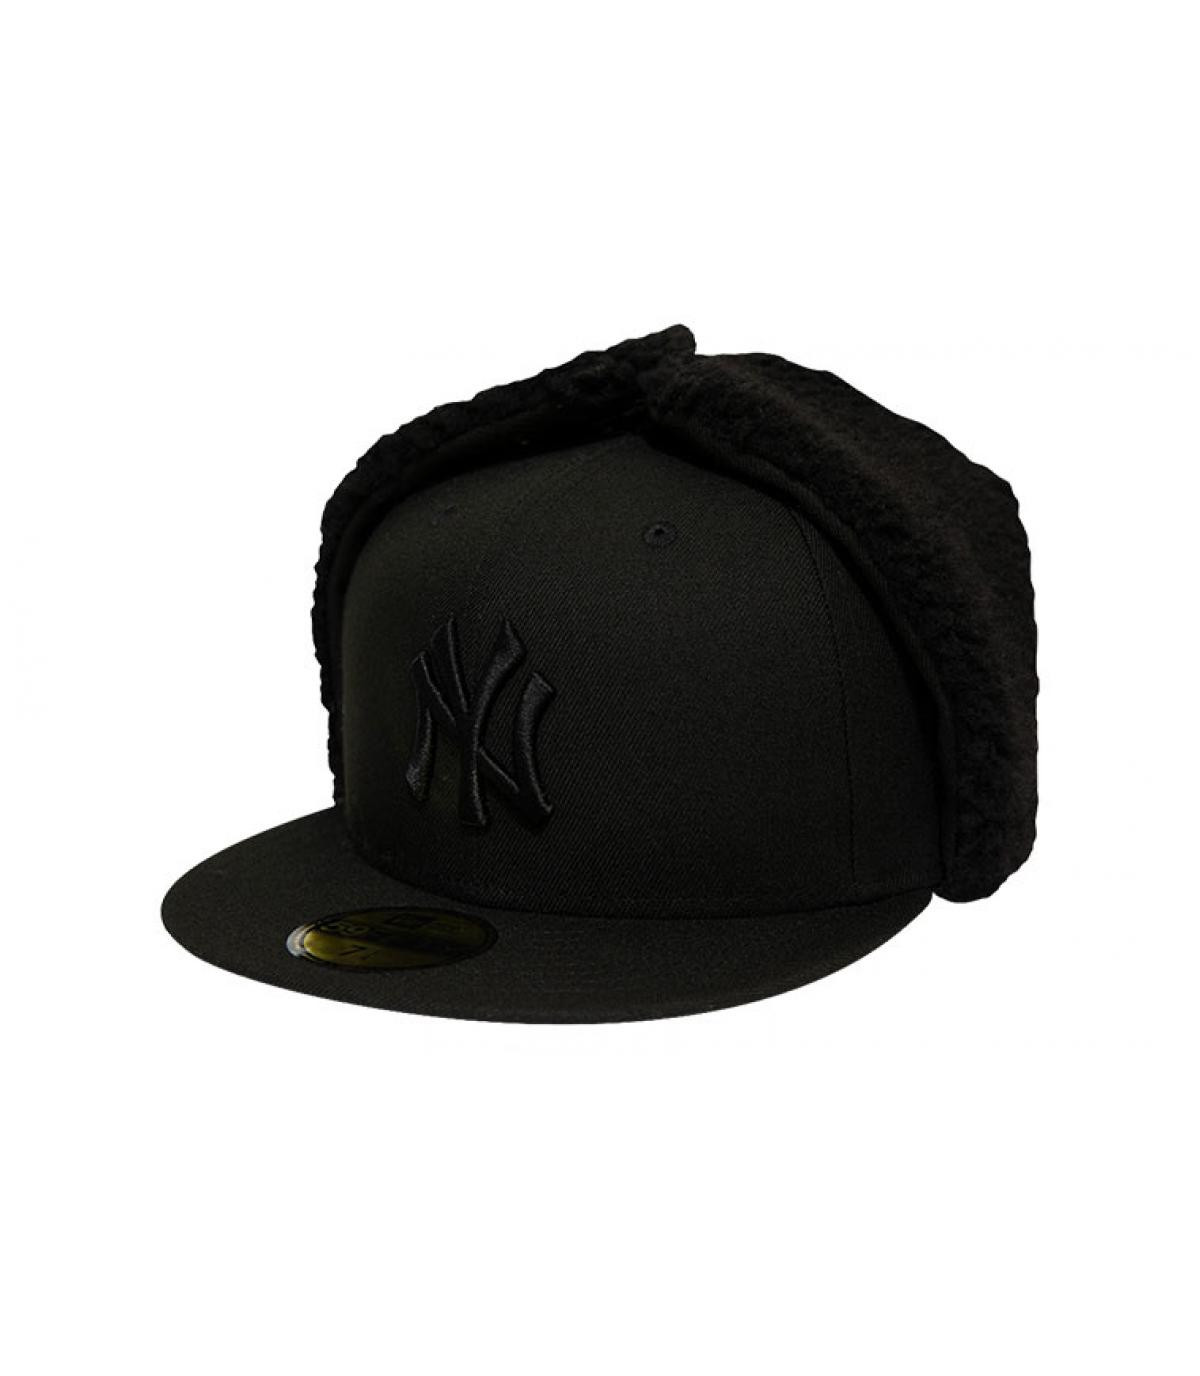 Details Cap League Ess Dogear NY 5950 black black - Abbildung 2